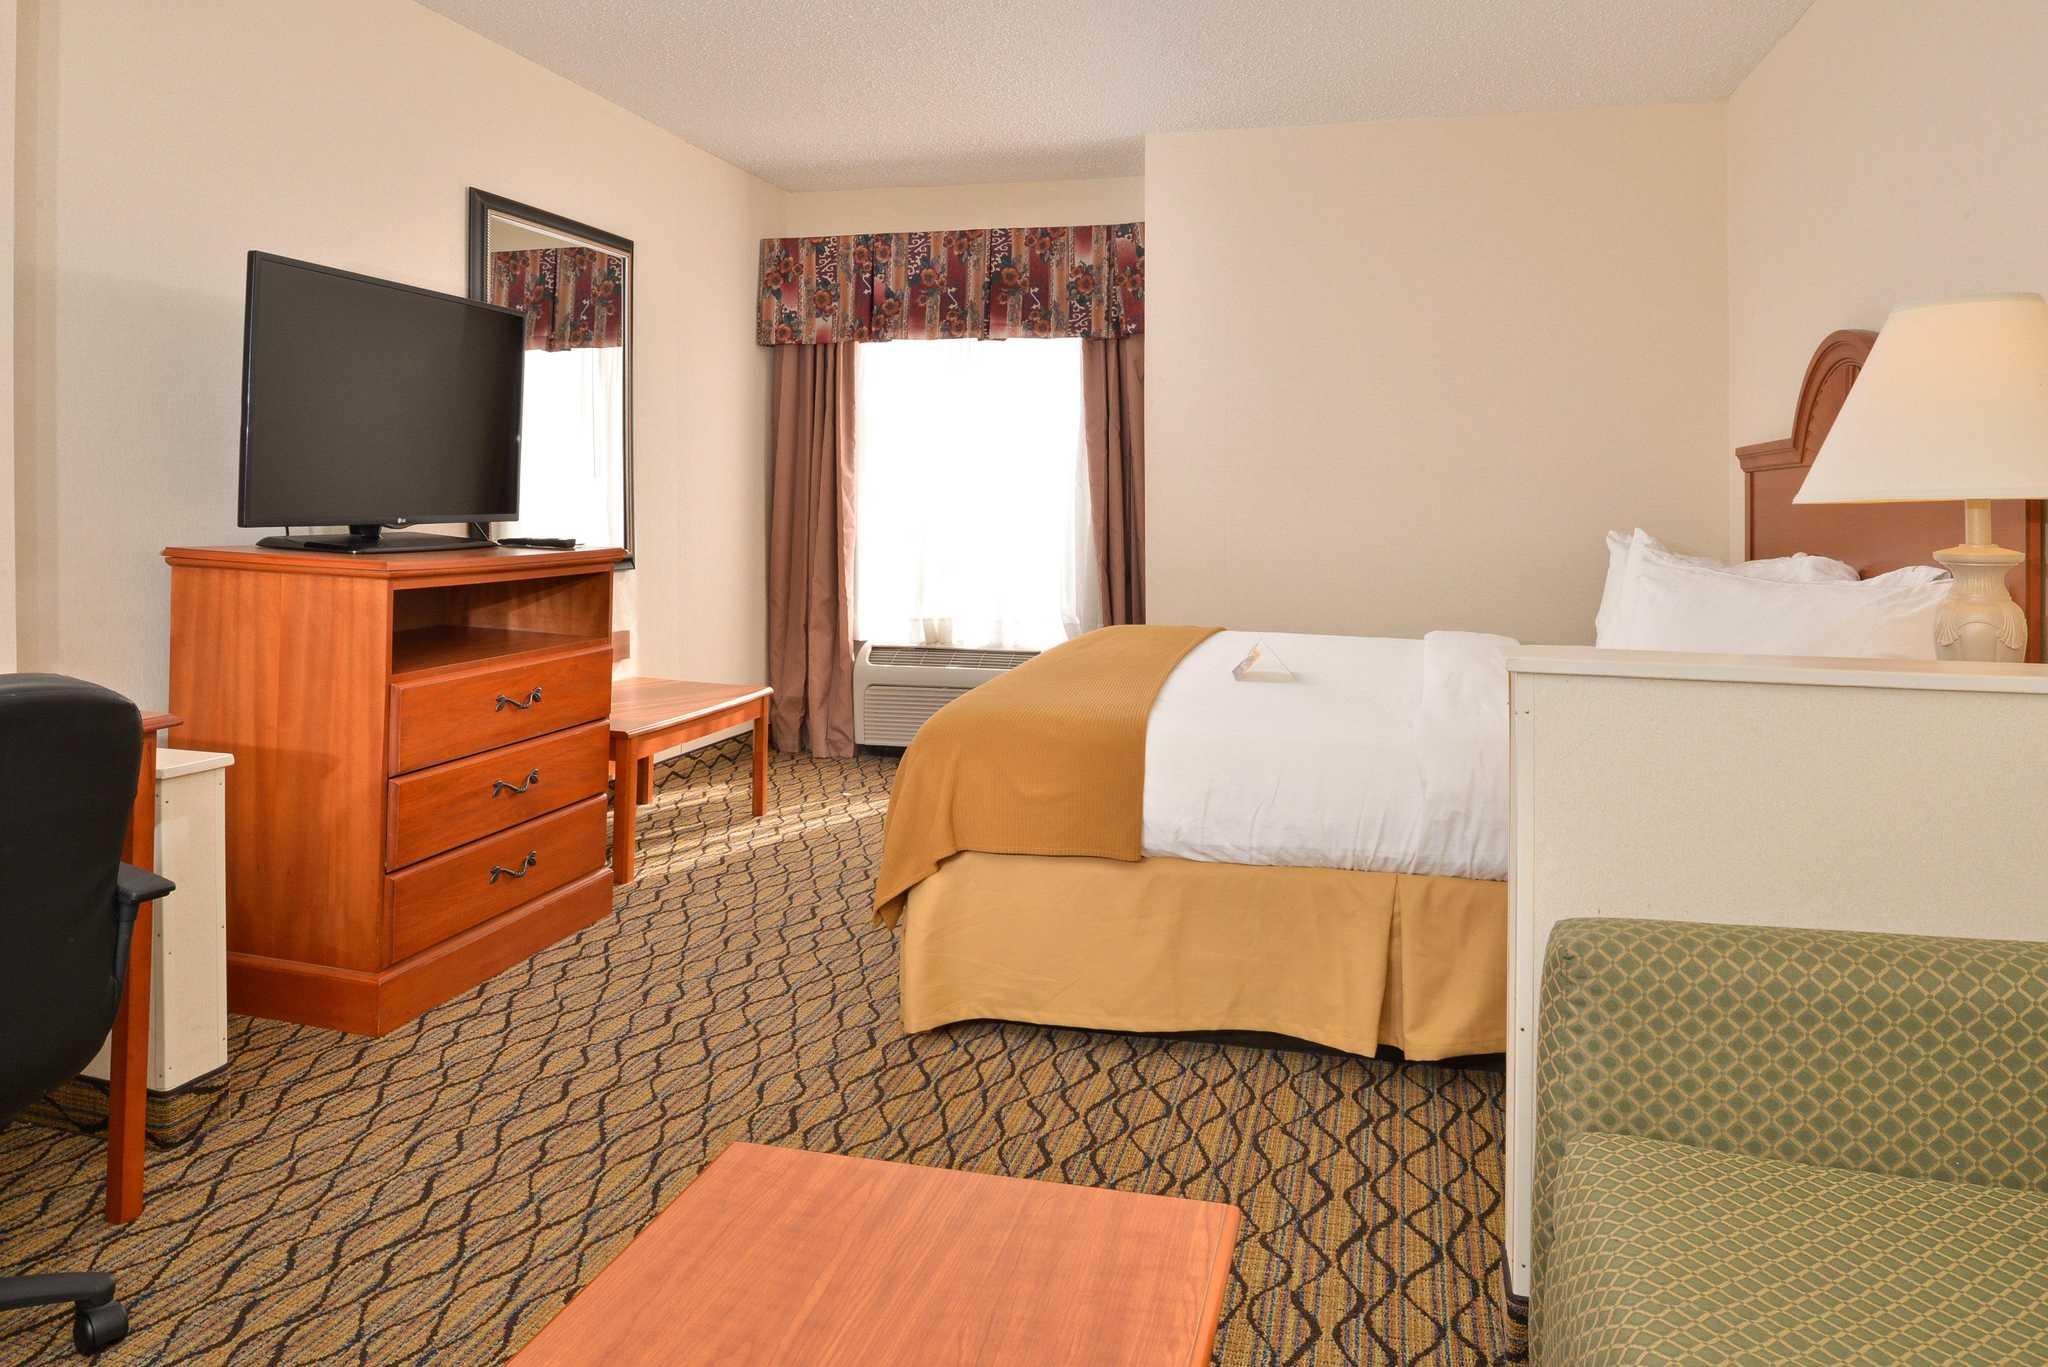 Quality Inn & Suites Jefferson City image 11